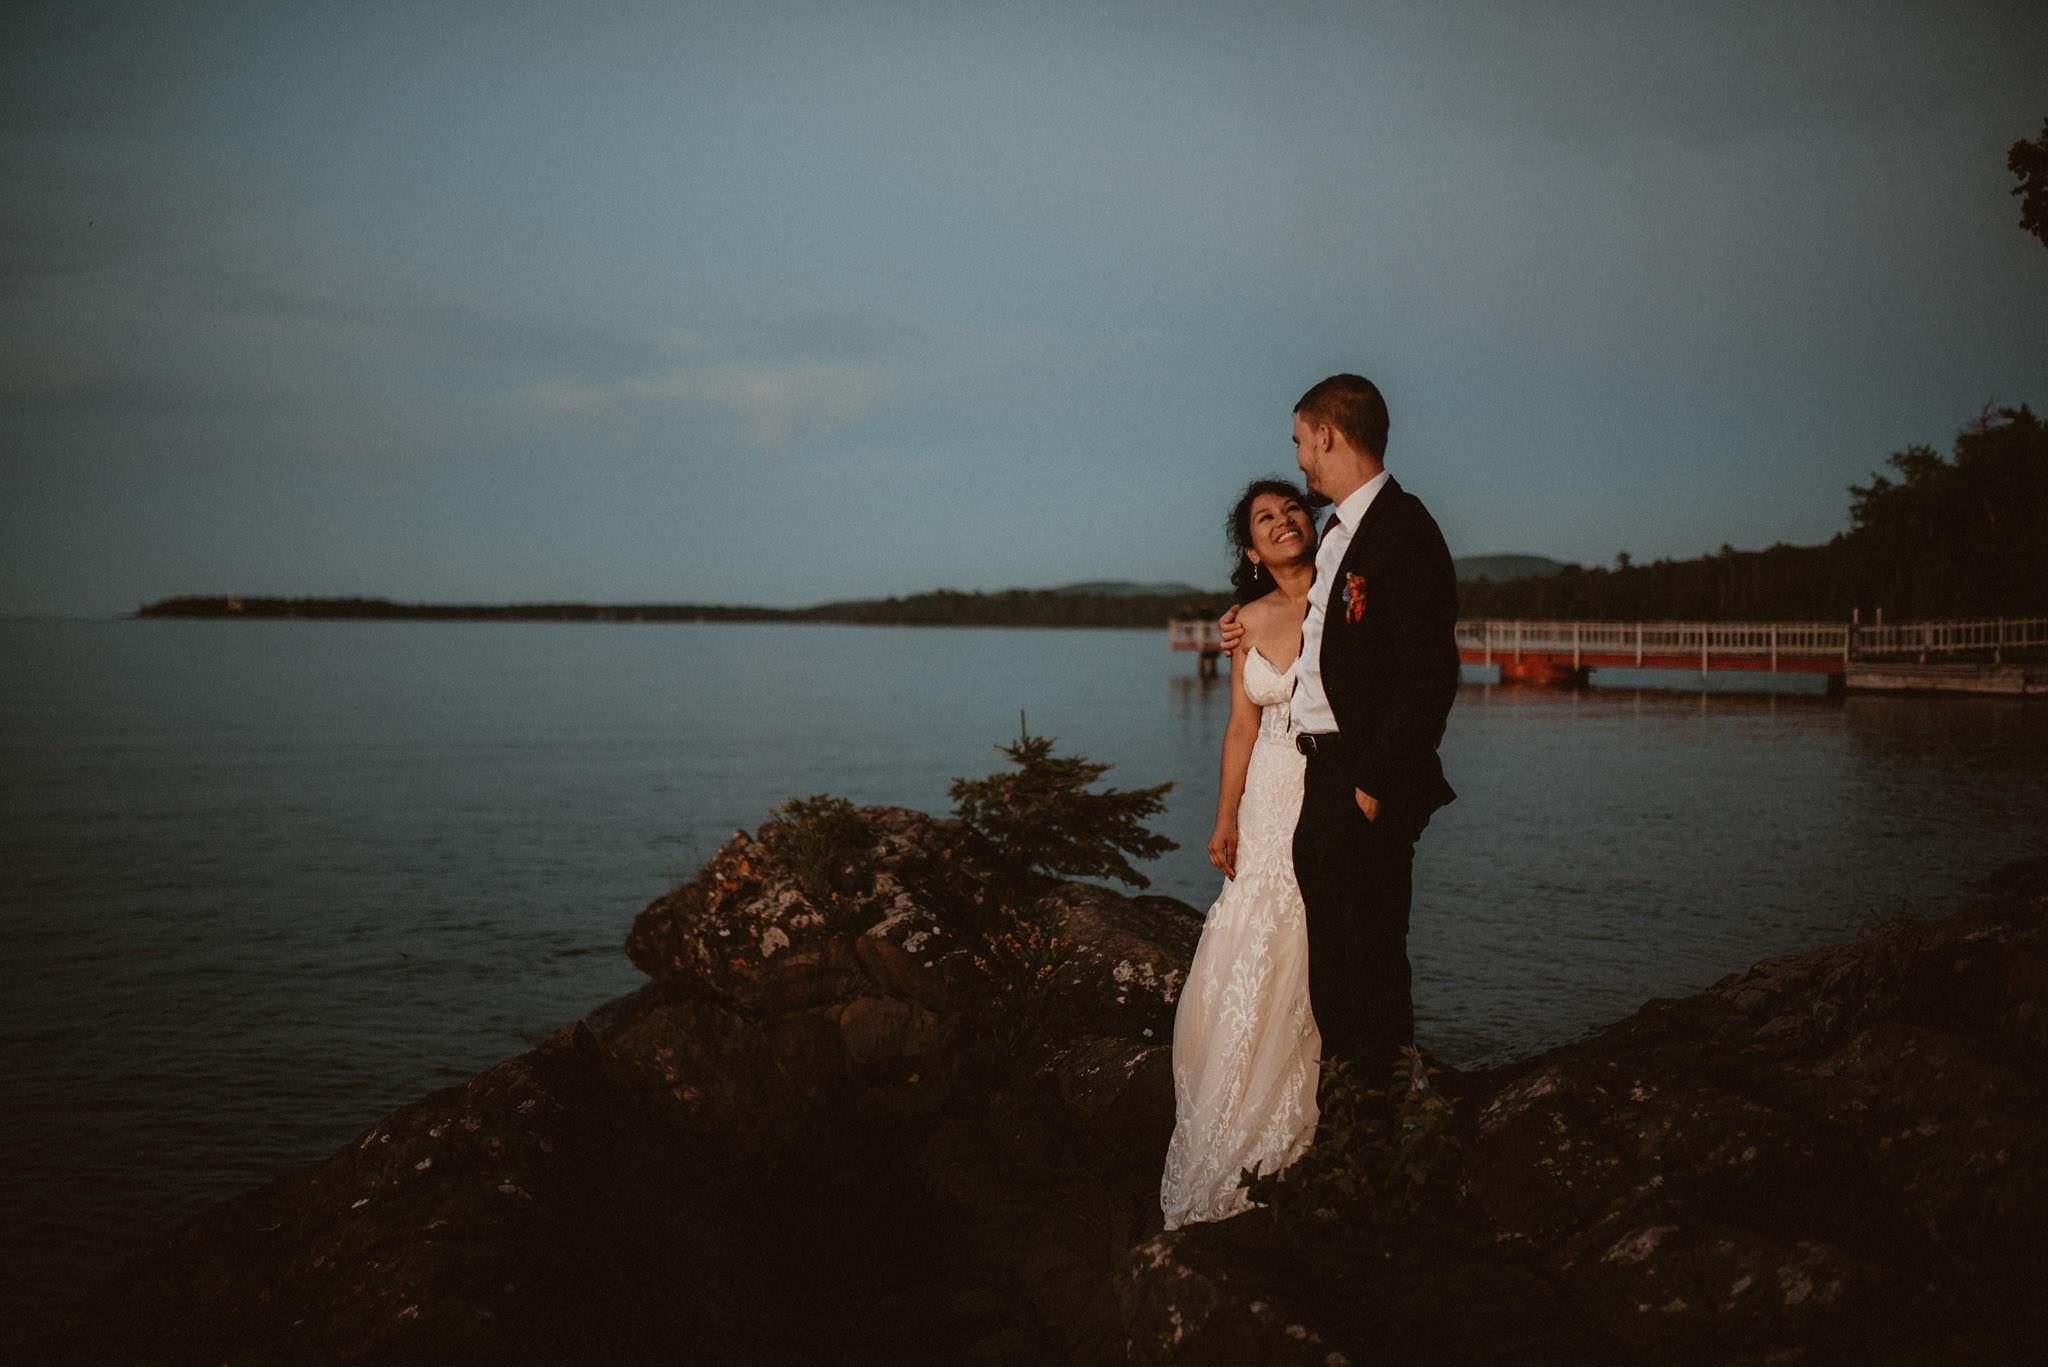 Bride and groom portraits in Copper Harbor, Michigan